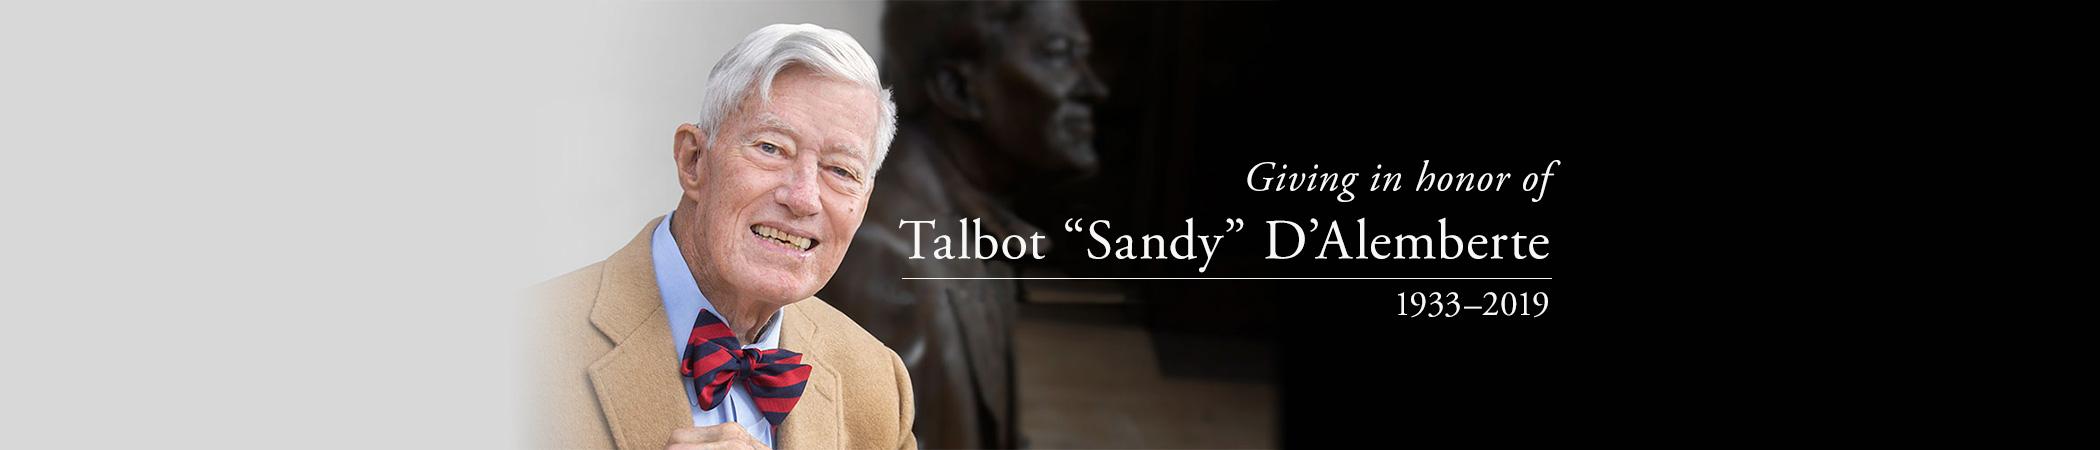 "Giving in honor of Talbot ""Sandy"" D'Alemberte"